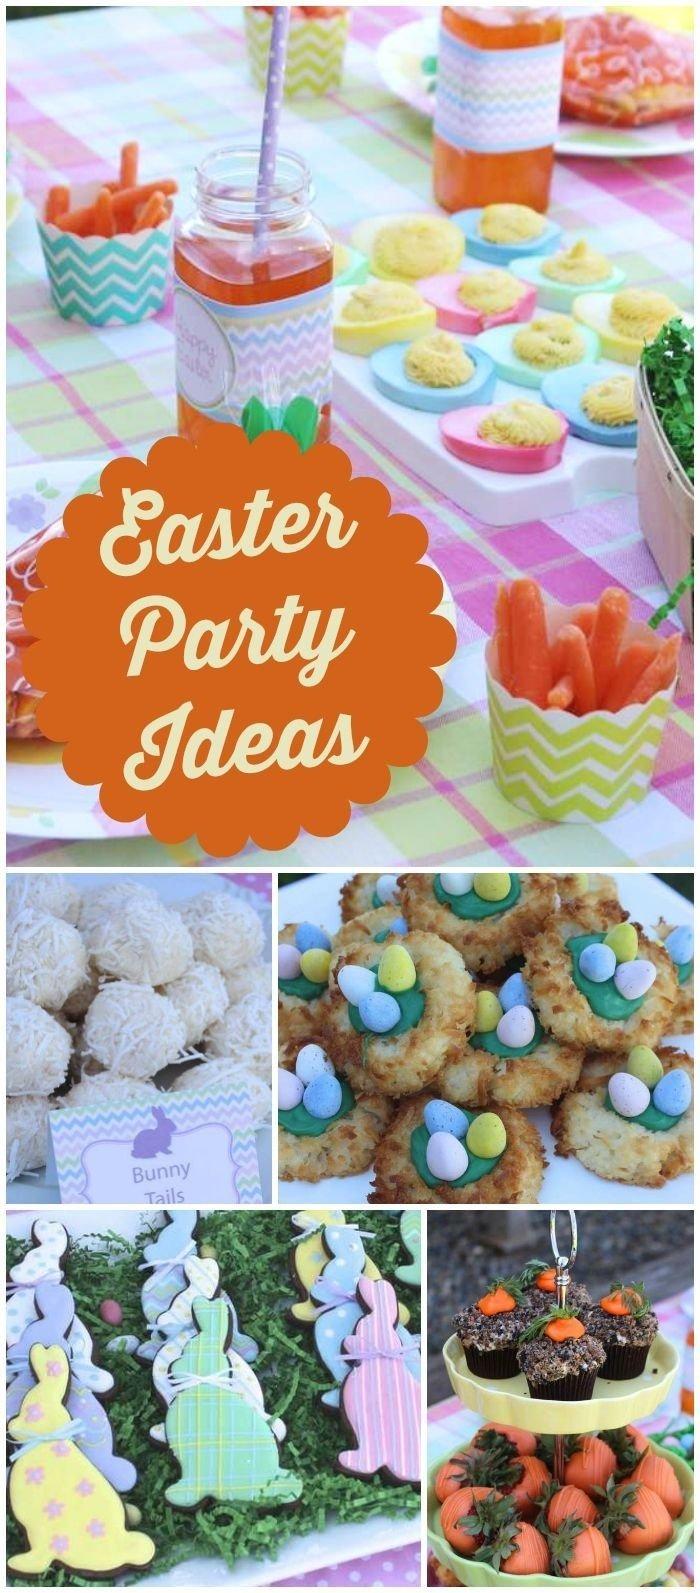 10 Beautiful Church Easter Egg Hunt Ideas easter easter gist family easter egg hunt picnic lunches 2020